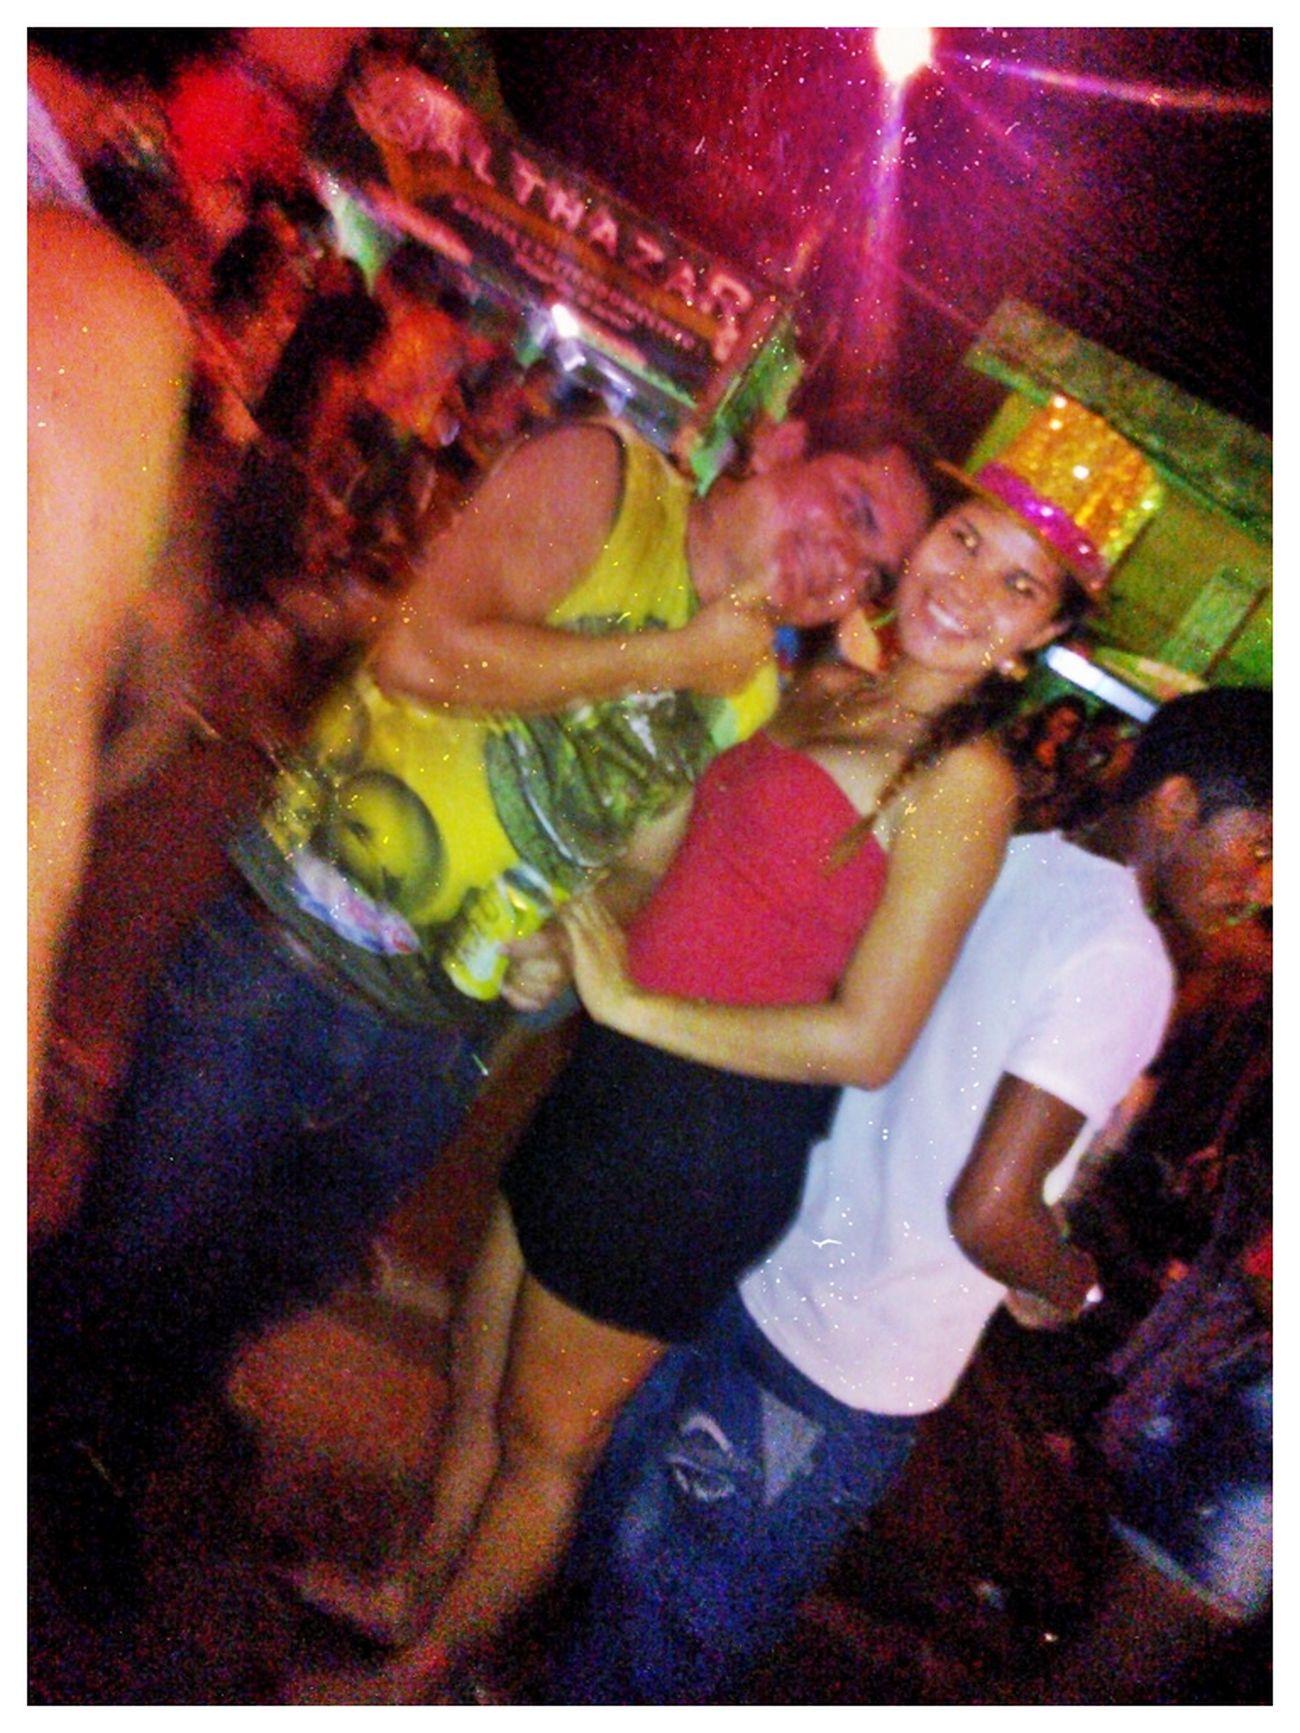 #tio#DJ#amooo